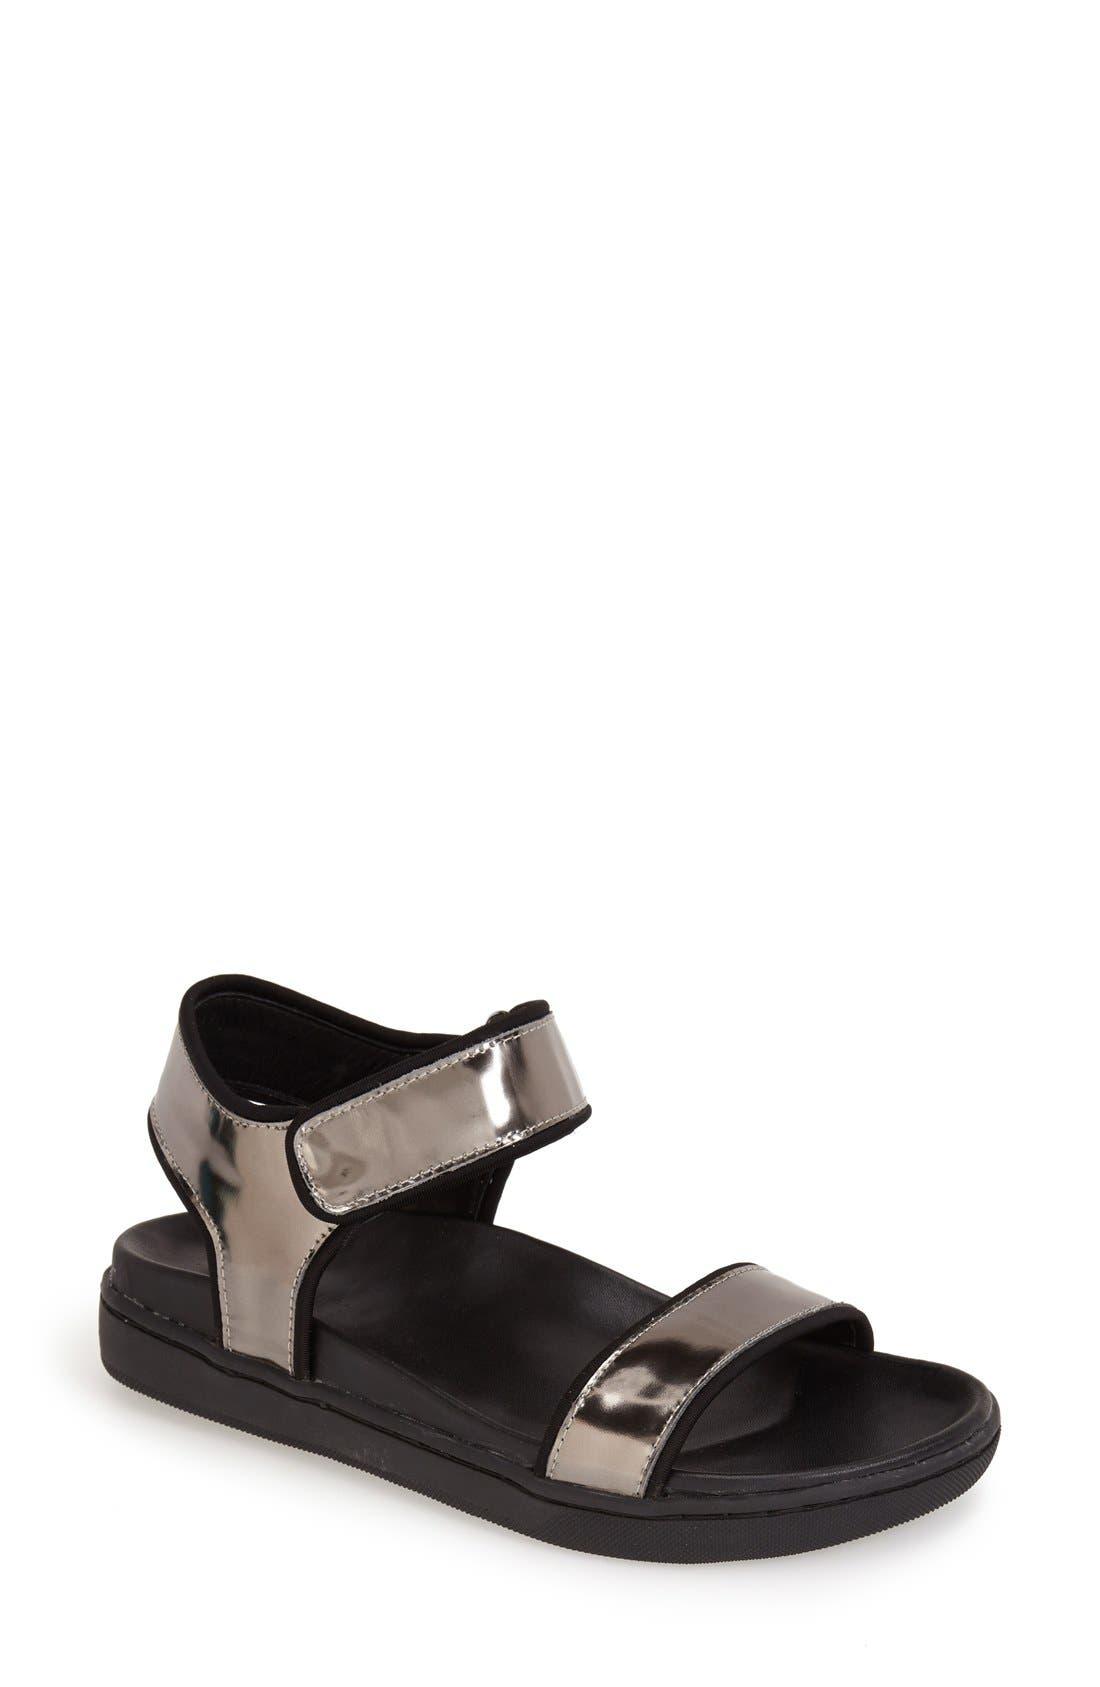 Main Image - Ateljé 71 'Astra' Two Strap Sandal (Women)